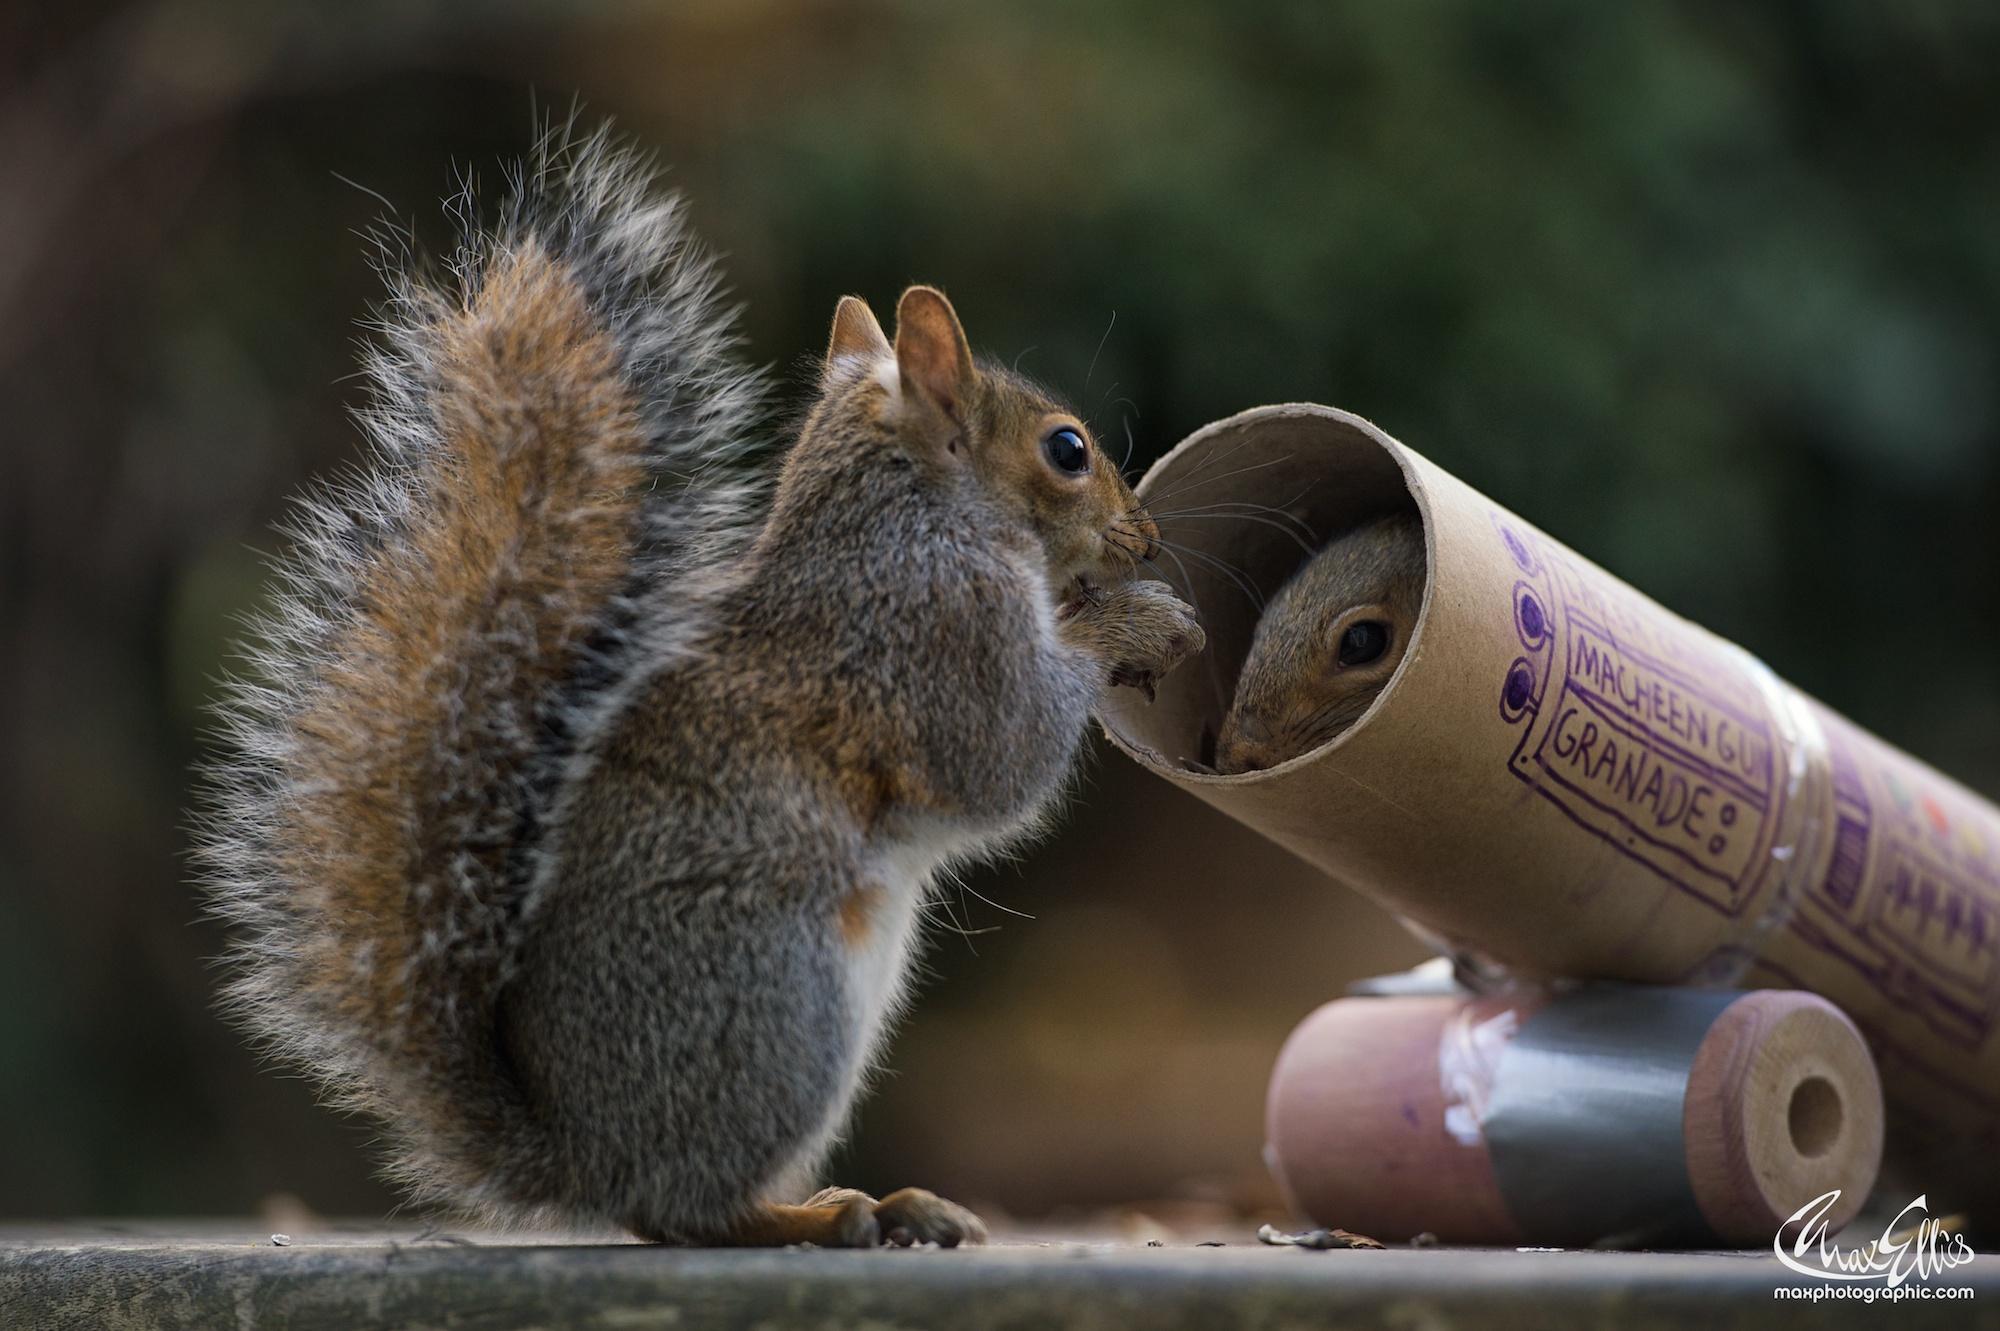 Beautiful Squirrels of Photographer Max Ellis #artpeople